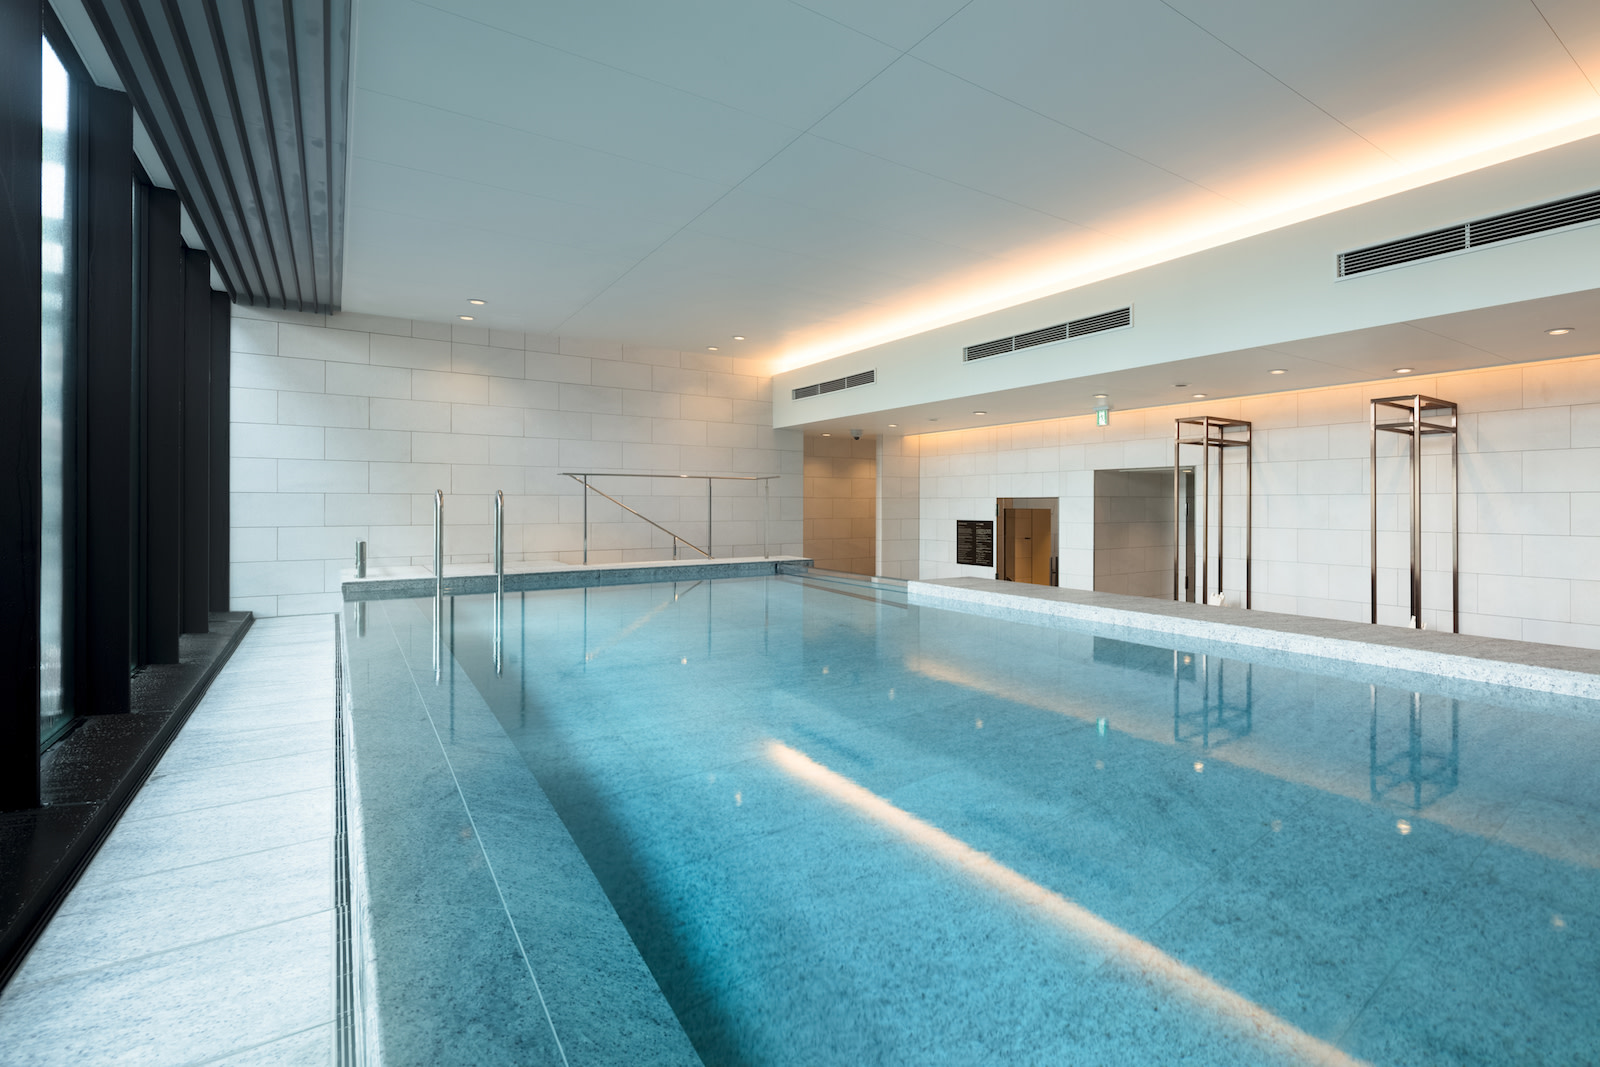 SR Japan Tokyo Asc Marunouchi Pool2-HR アスコット丸の内東京 | Workations(ワーケーションズ)